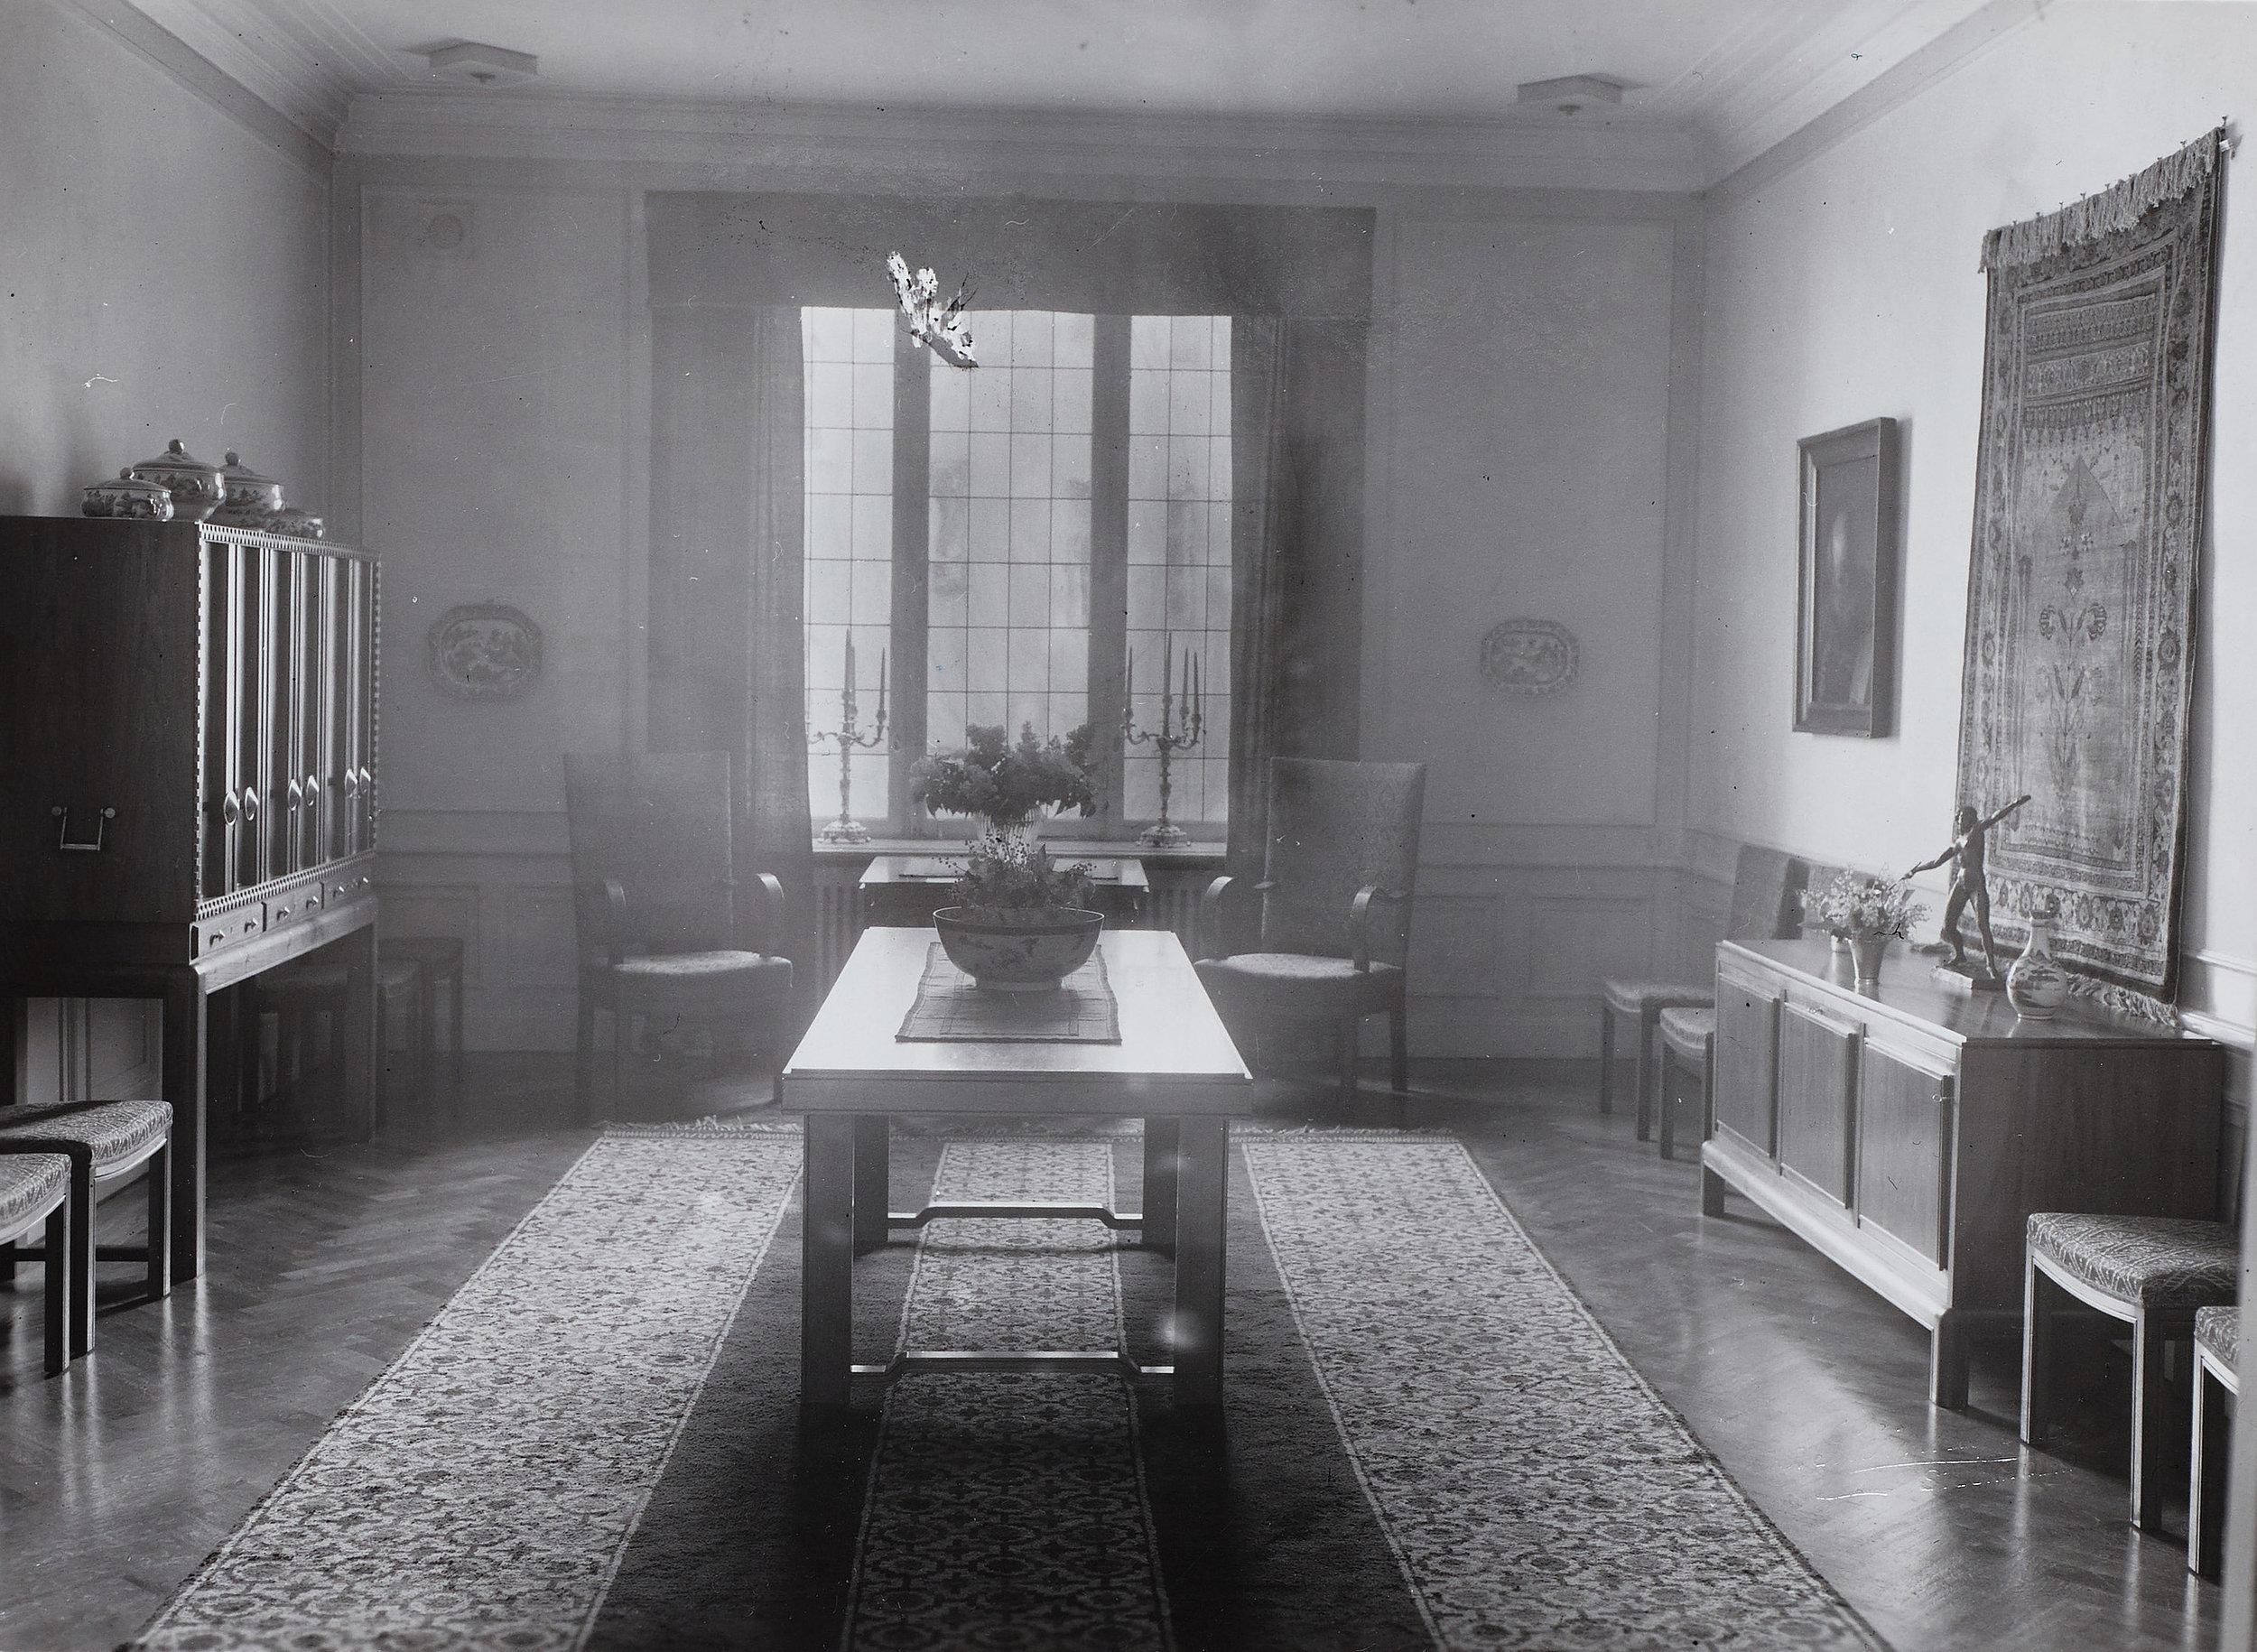 Sideboard — Ahrbom & Zimdal 1932